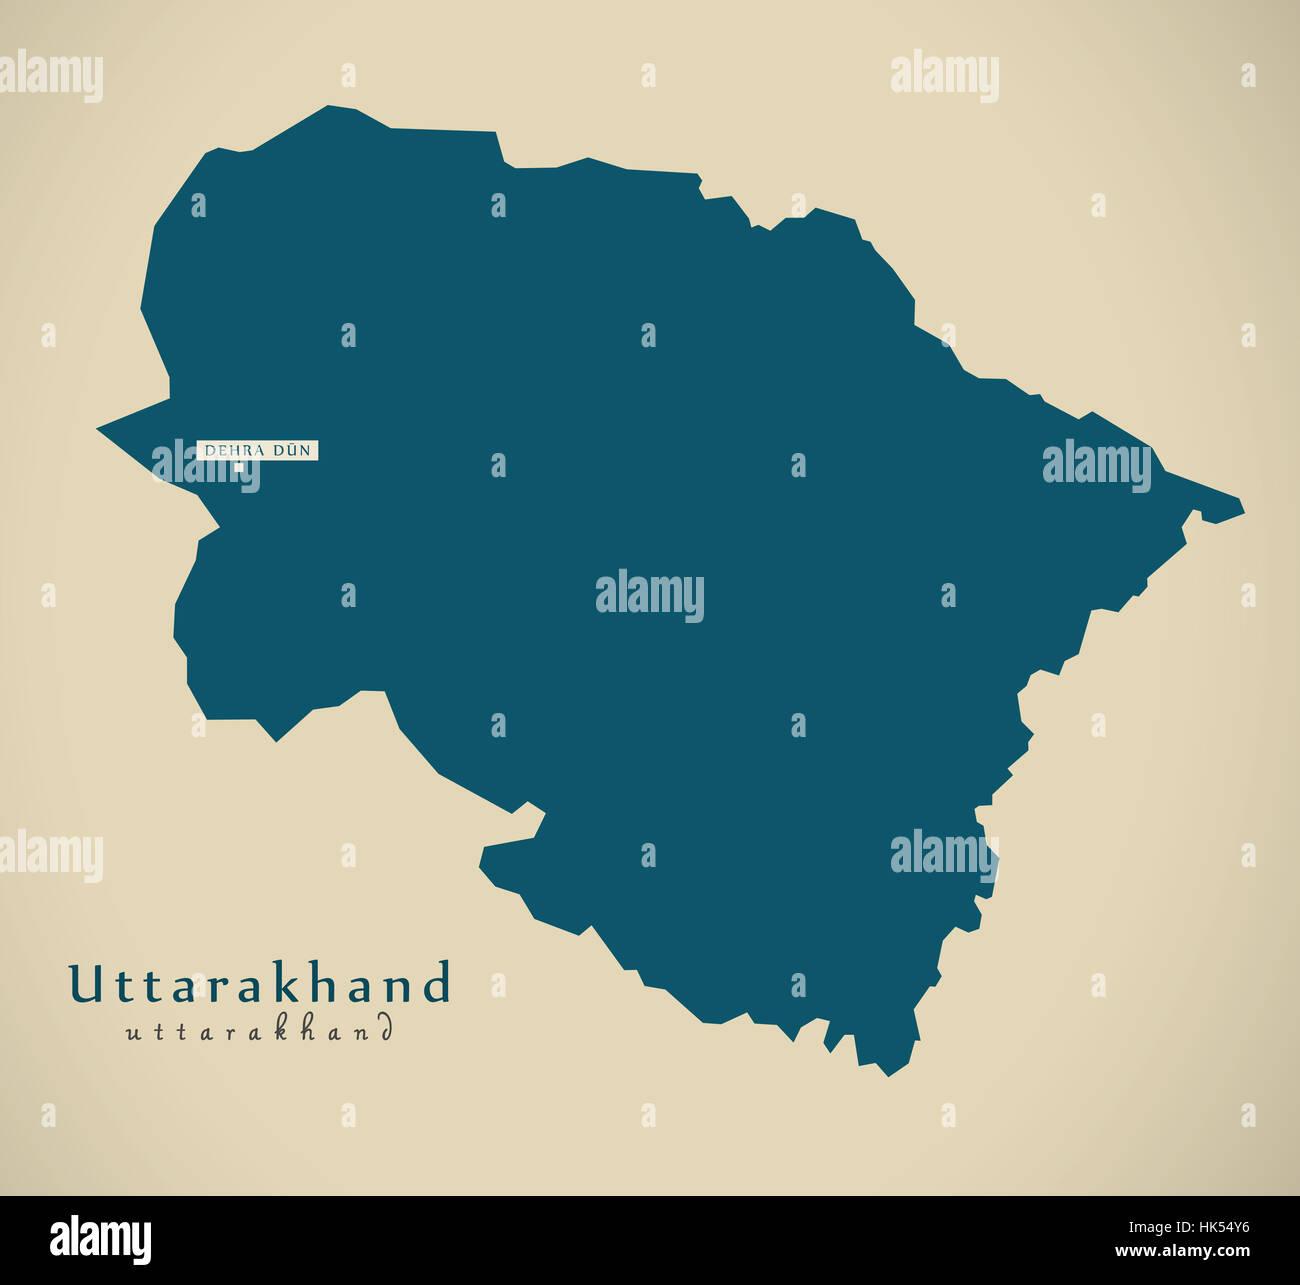 Map Of Uttarakhand Stock Photos & Map Of Uttarakhand Stock Images ...